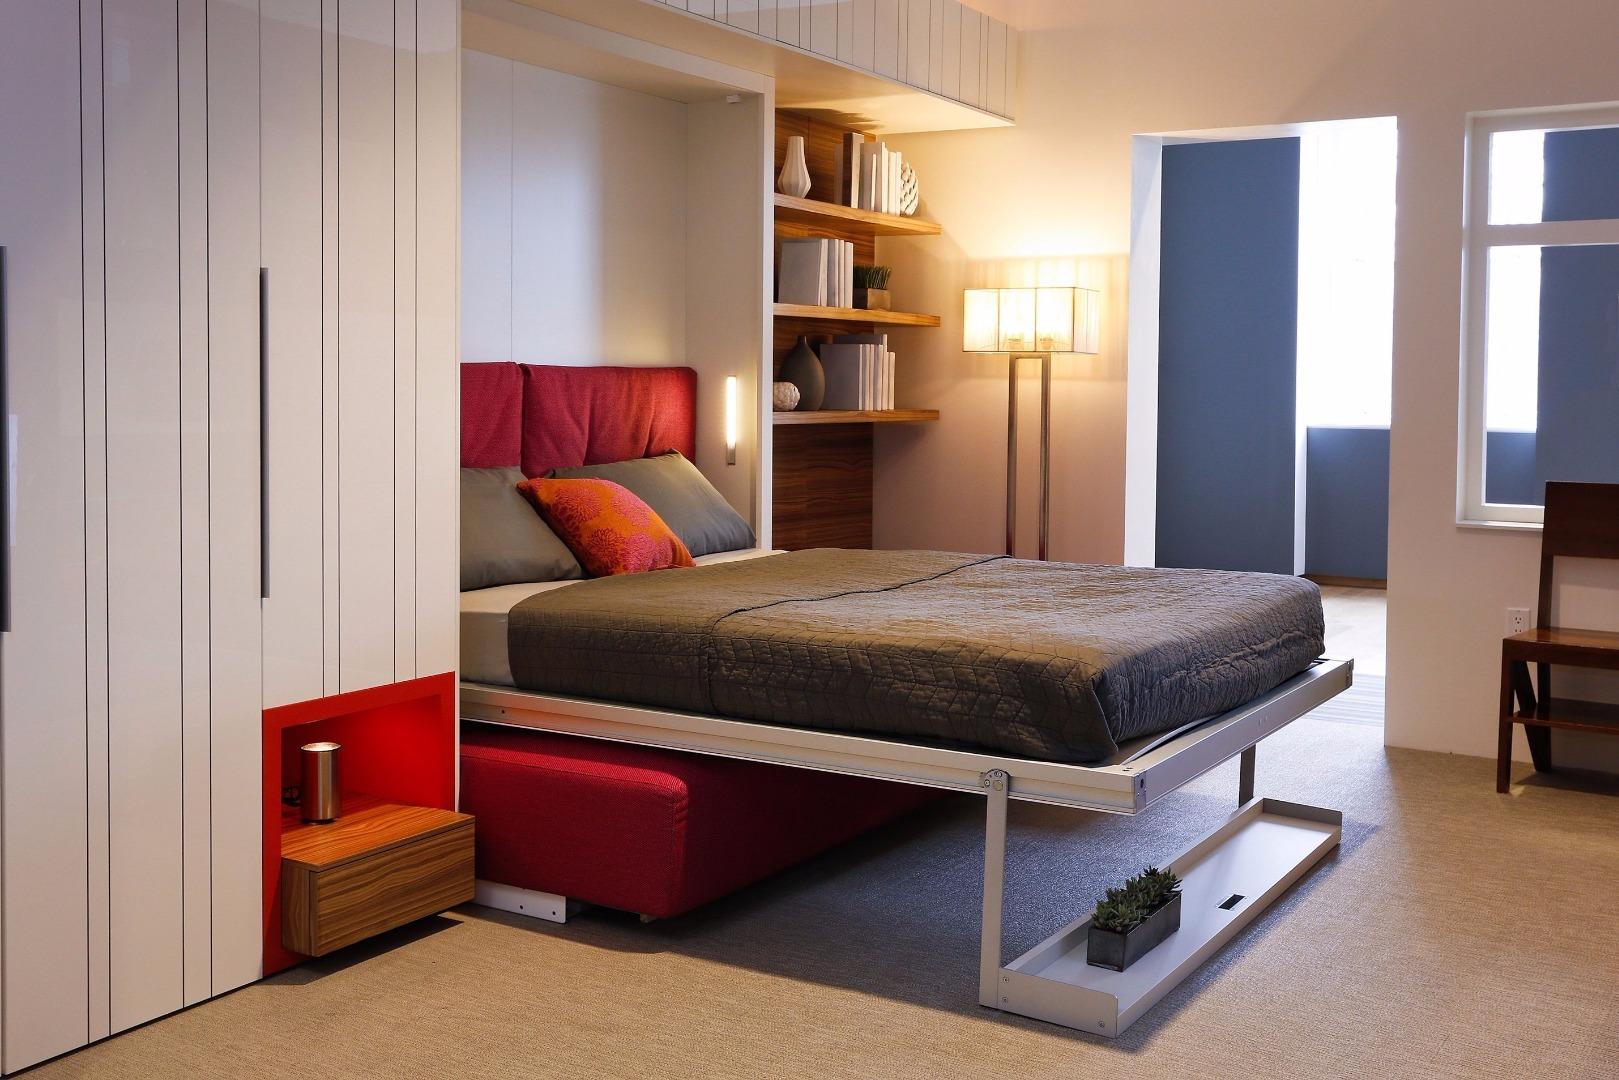 Micro apartment propsocial small condominium property home